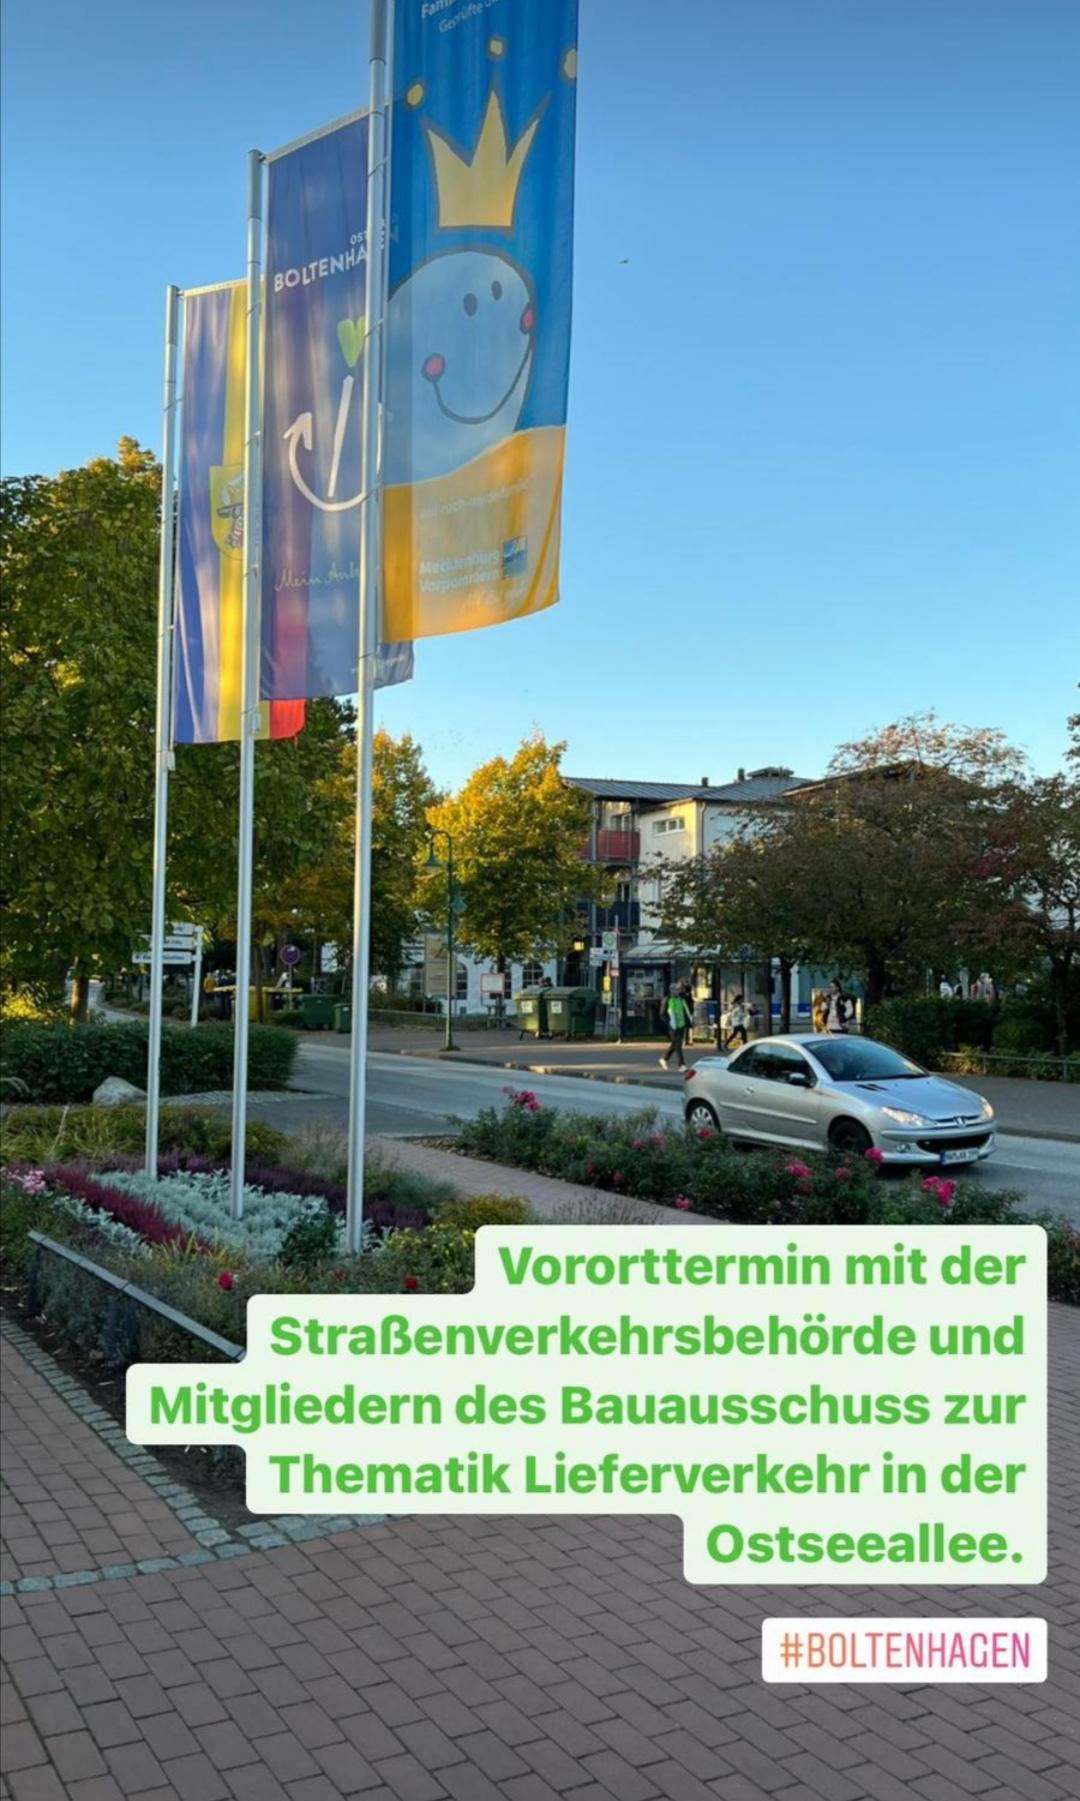 Vor-Ort-Termin Bürgermeister, Bauausschuss, Straßenverkehrsbehörde zum Thema Lieferverkehr an der Ostseeallee.